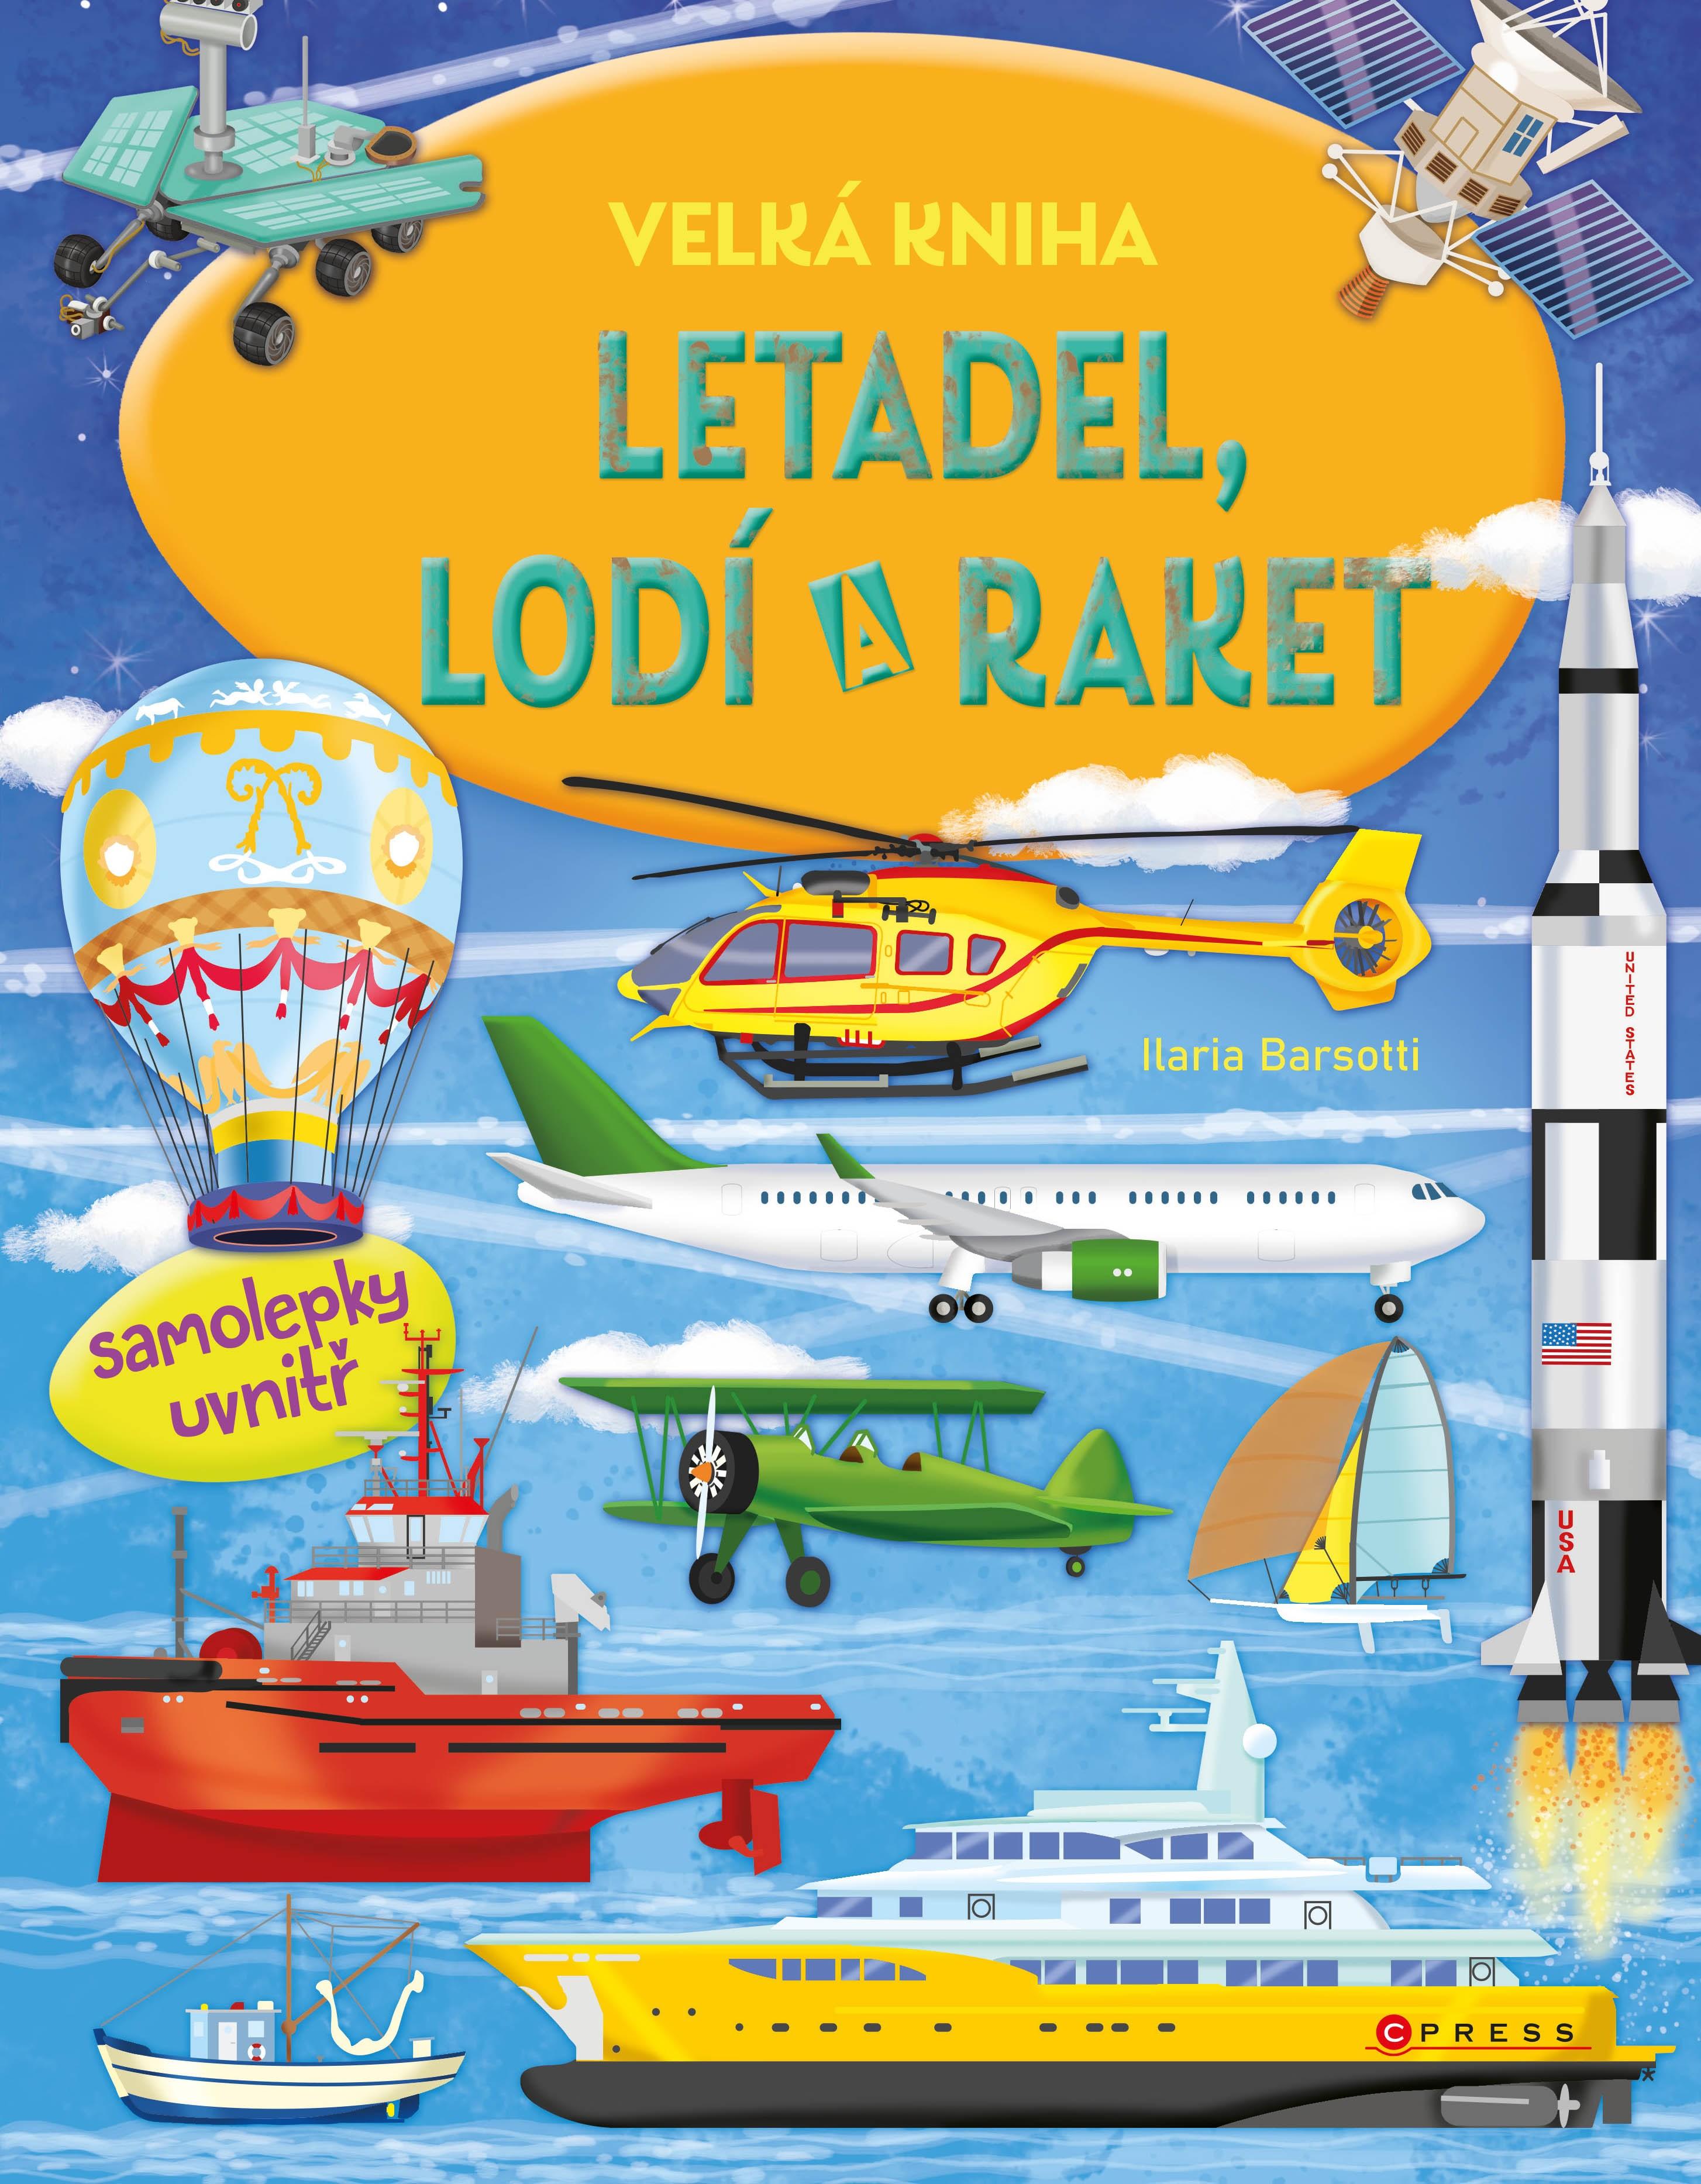 CPRESS Velká kniha letadel, lodí a raket - Ilaria Barsotti